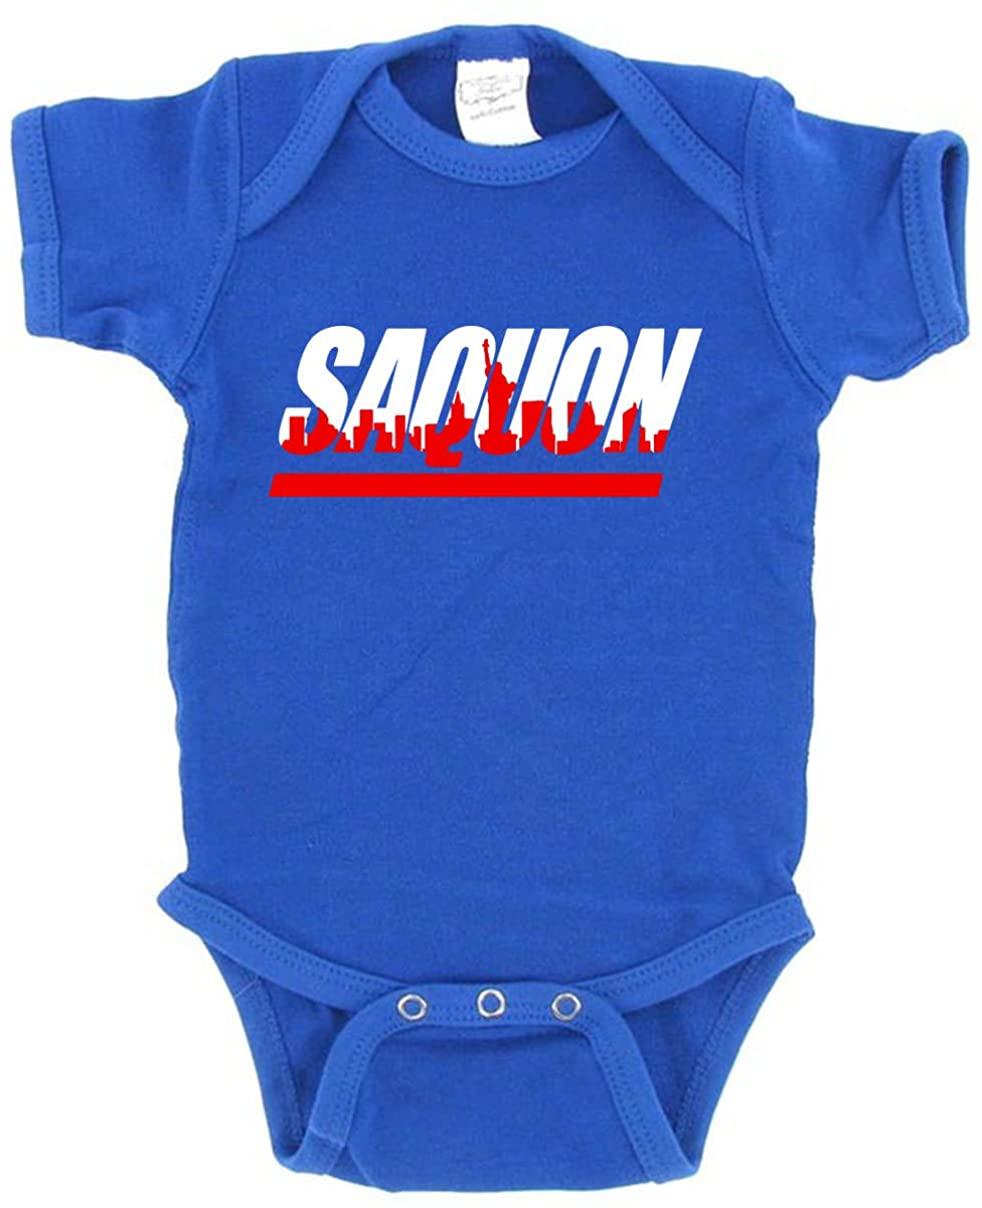 The Tune Guys Blue New York Saquon Skyline Baby 1 Piece